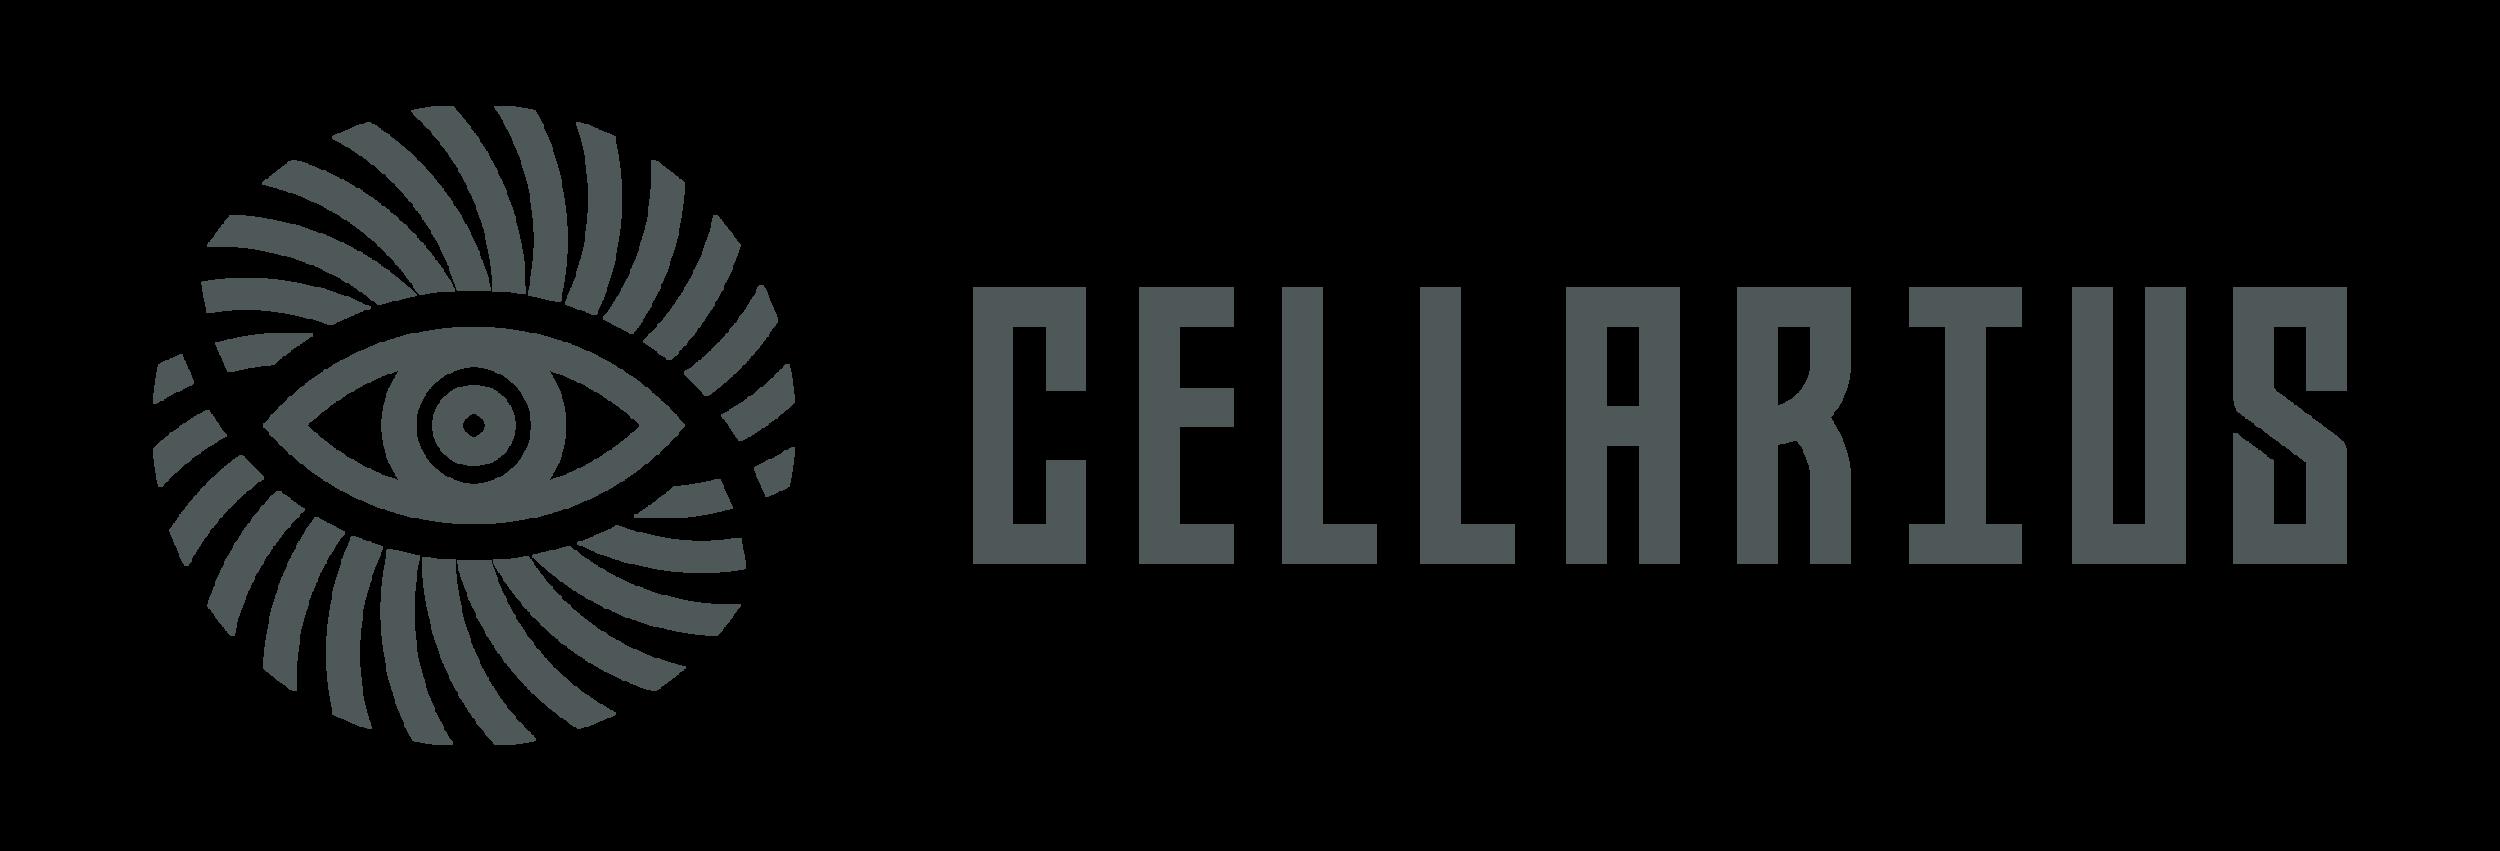 cellariuslogo.png